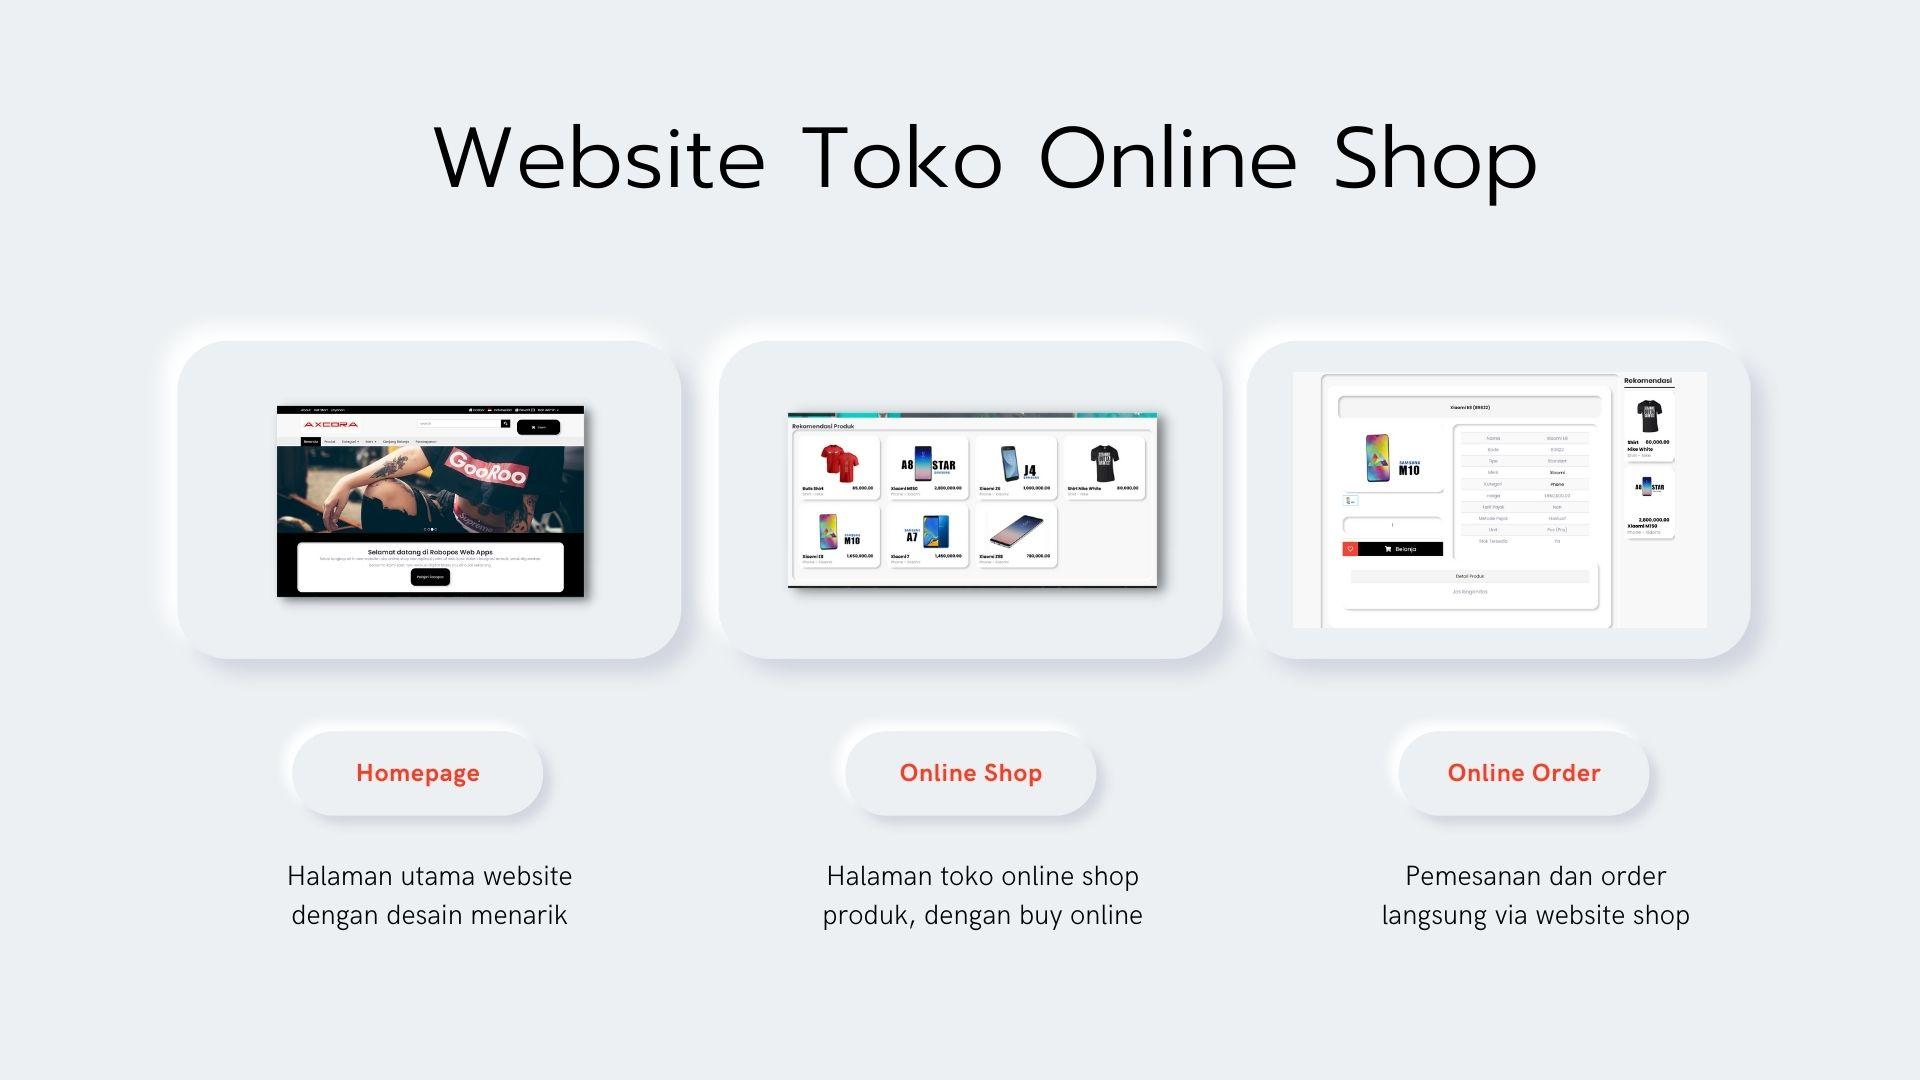 aplikasi kasir toko penjualan toko online shop